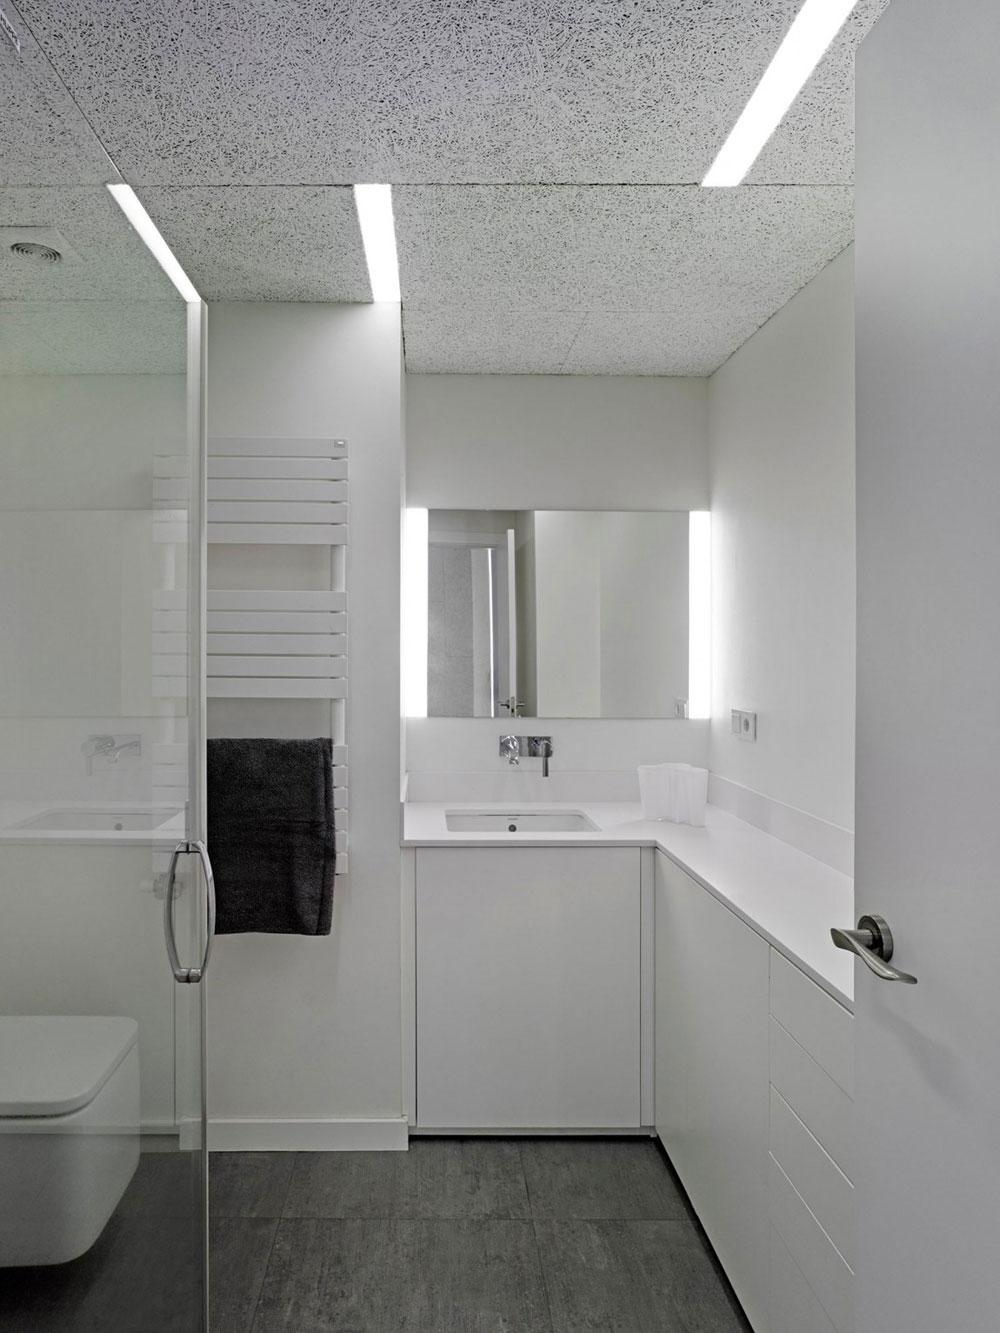 Bathroom-Interior Design-Photos-Presenting-Beautiful-Designs-7 Bathroom-Interior Design-Photos-Presenting Beautiful Designs